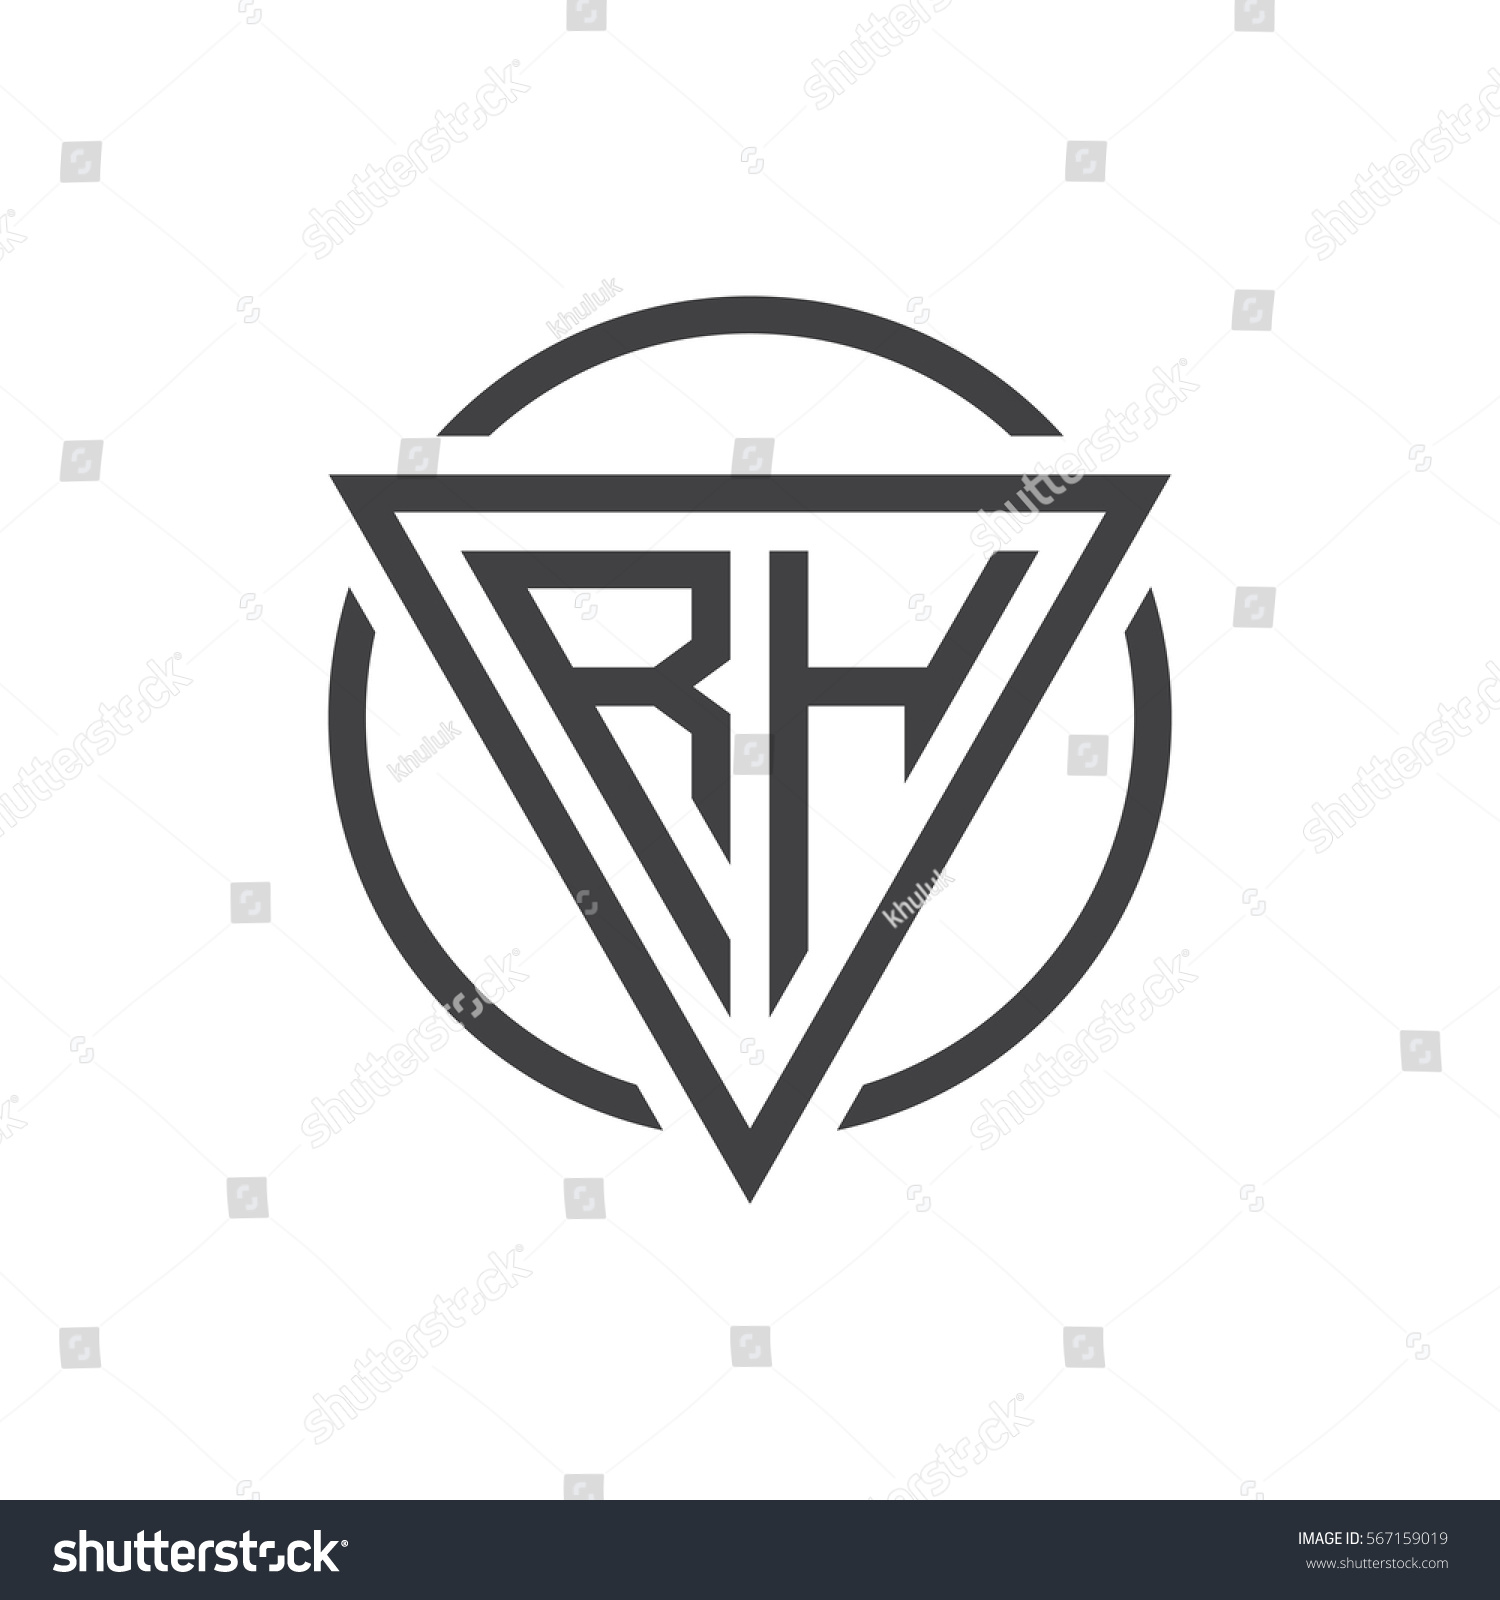 Initial letter logo triangle circle black stock vector 567159019 initial letter logo triangle circle black stock vector 567159019 shutterstock buycottarizona